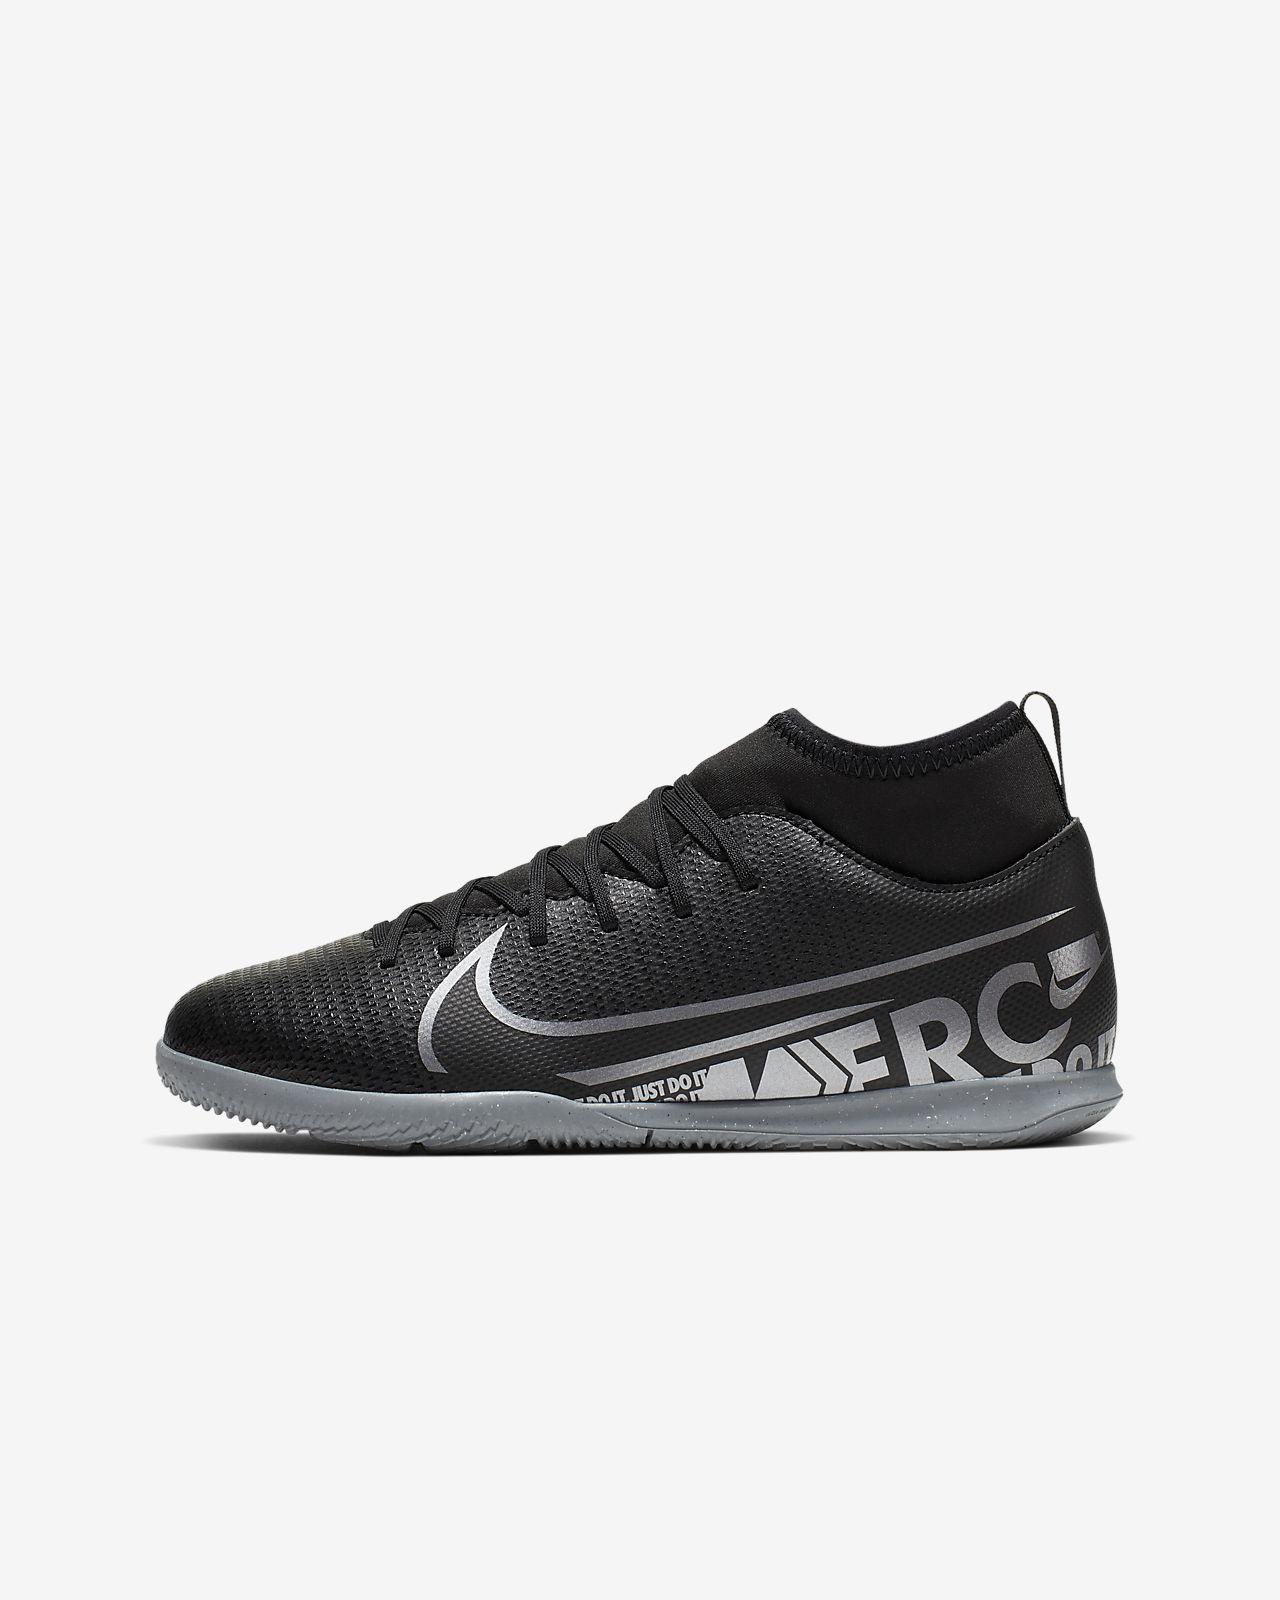 Scarpa da calcio per campi indoor/cemento Nike Jr. Mercurial Superfly 7 Club IC - Bambini/Ragazzi